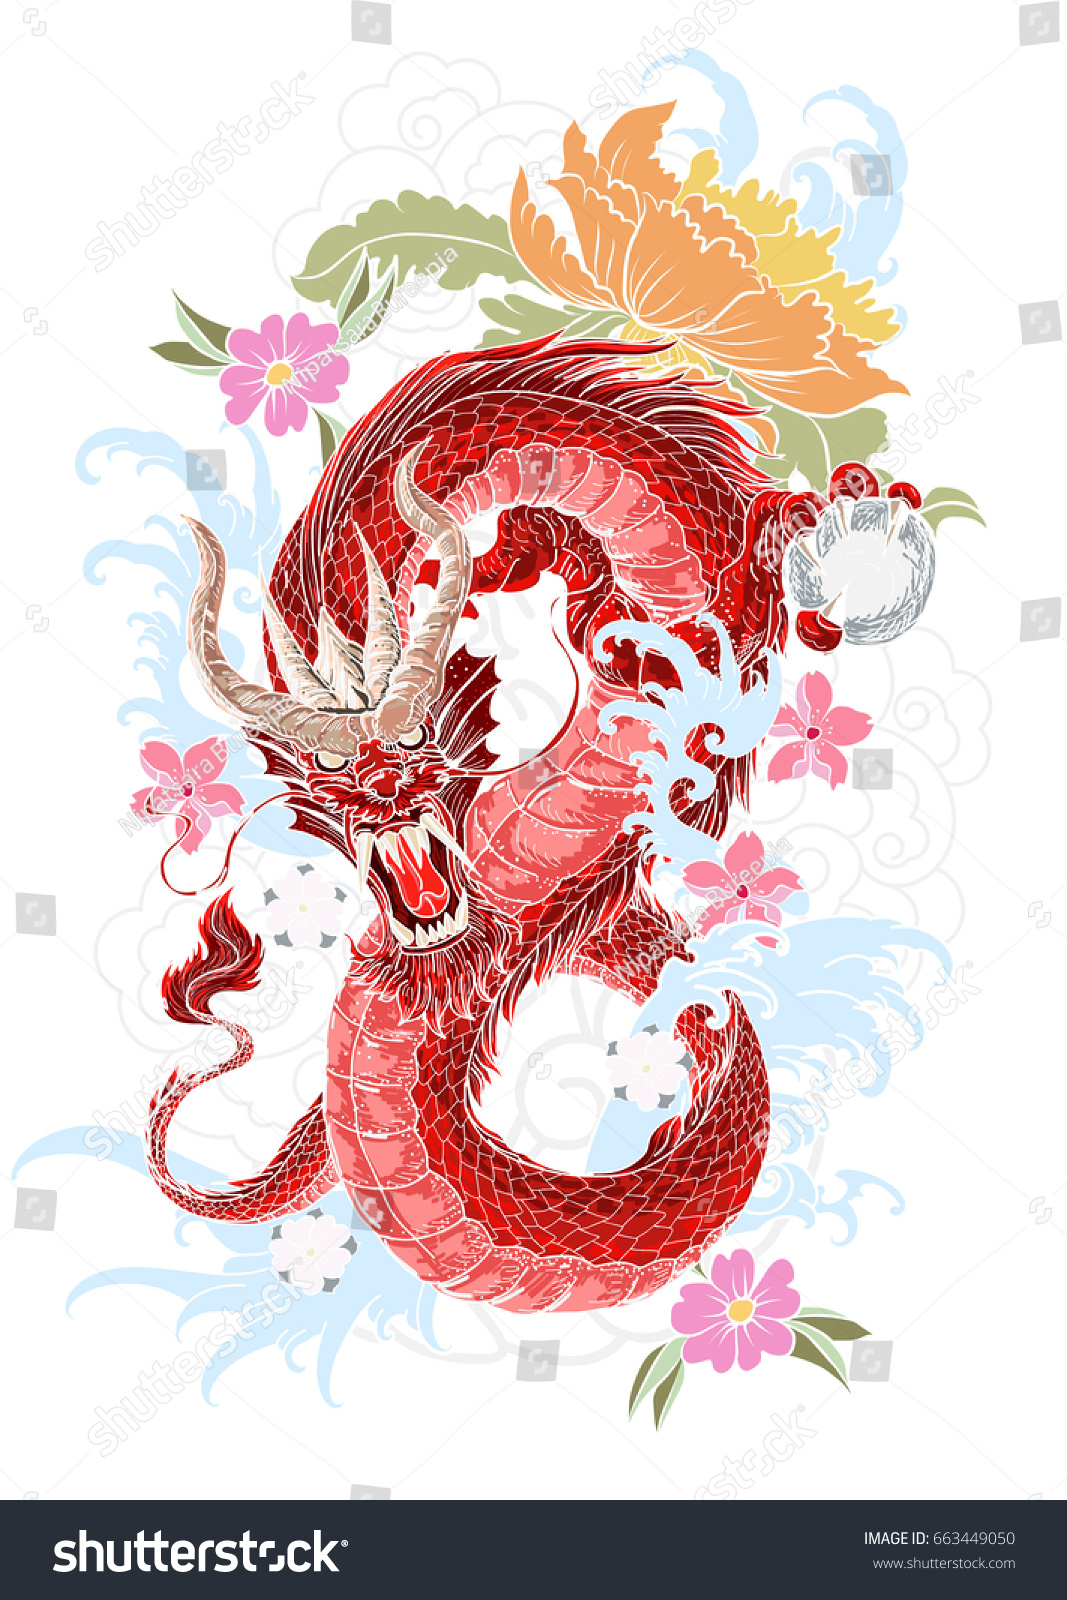 Hand Drawn Dragon Tattoo Coloring Book Stock Vector (Royalty Free ...